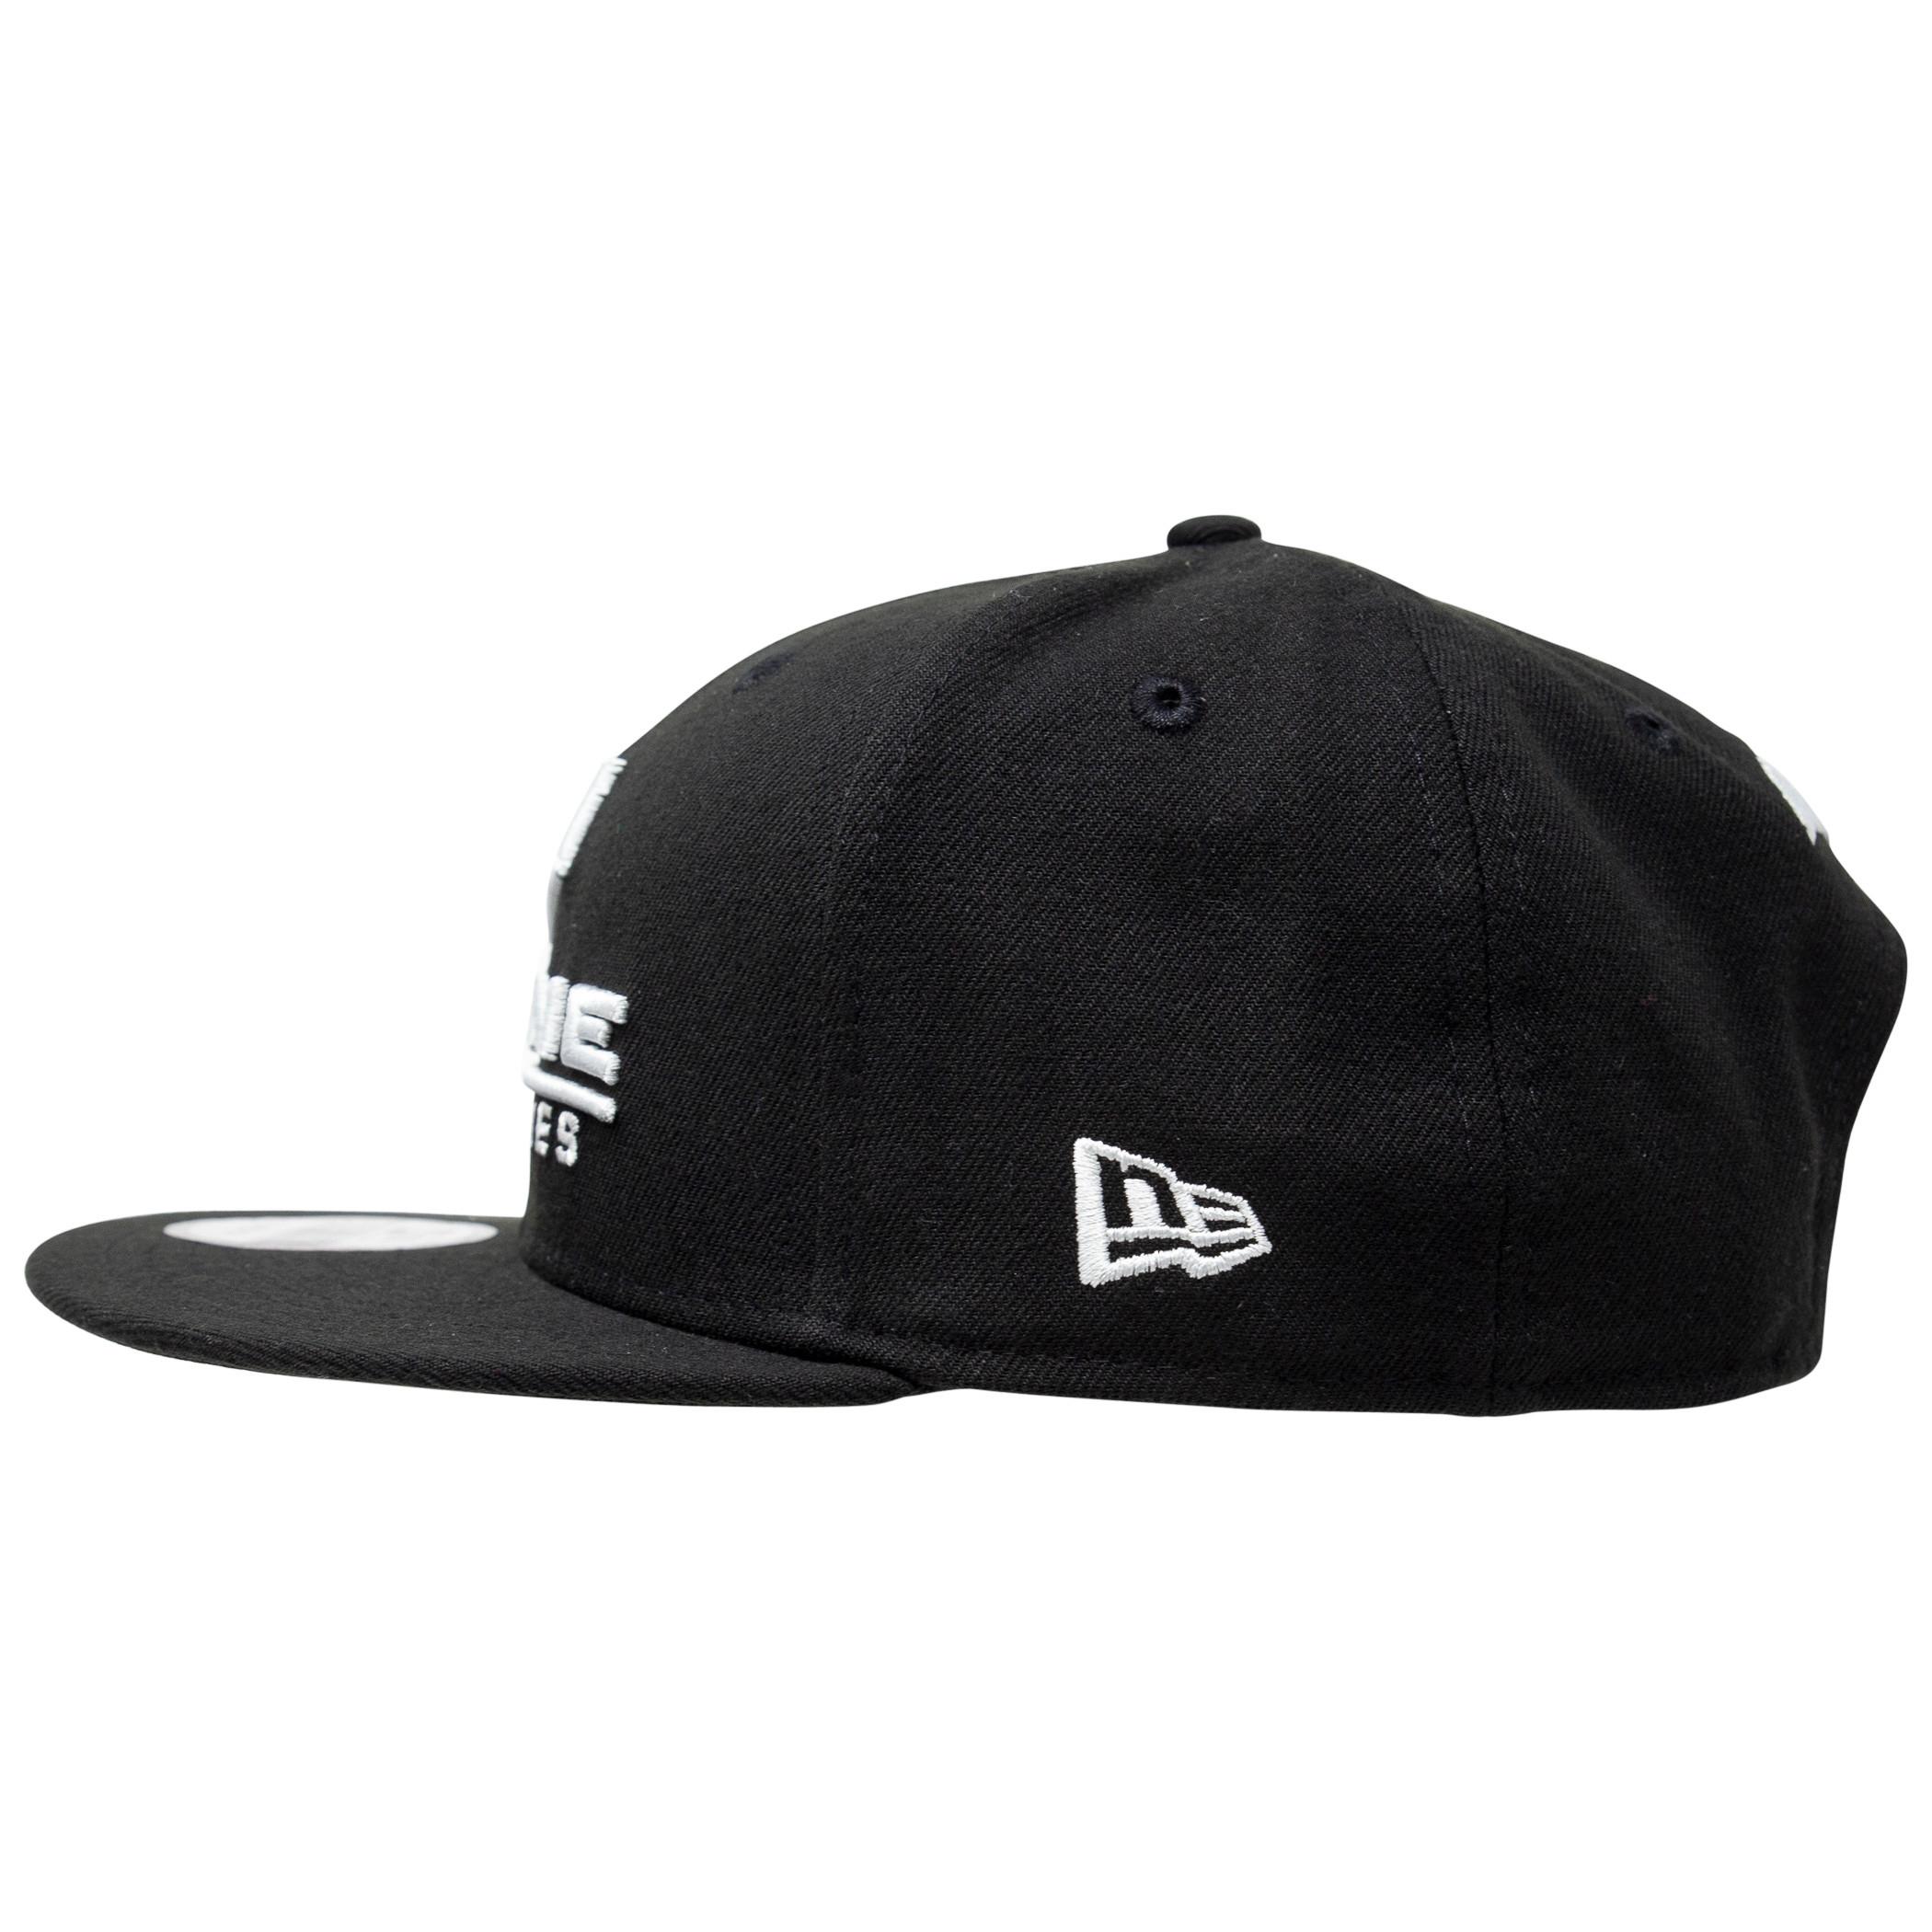 Batman Wayne Industries New Era 9Fifty Adjustable Hat